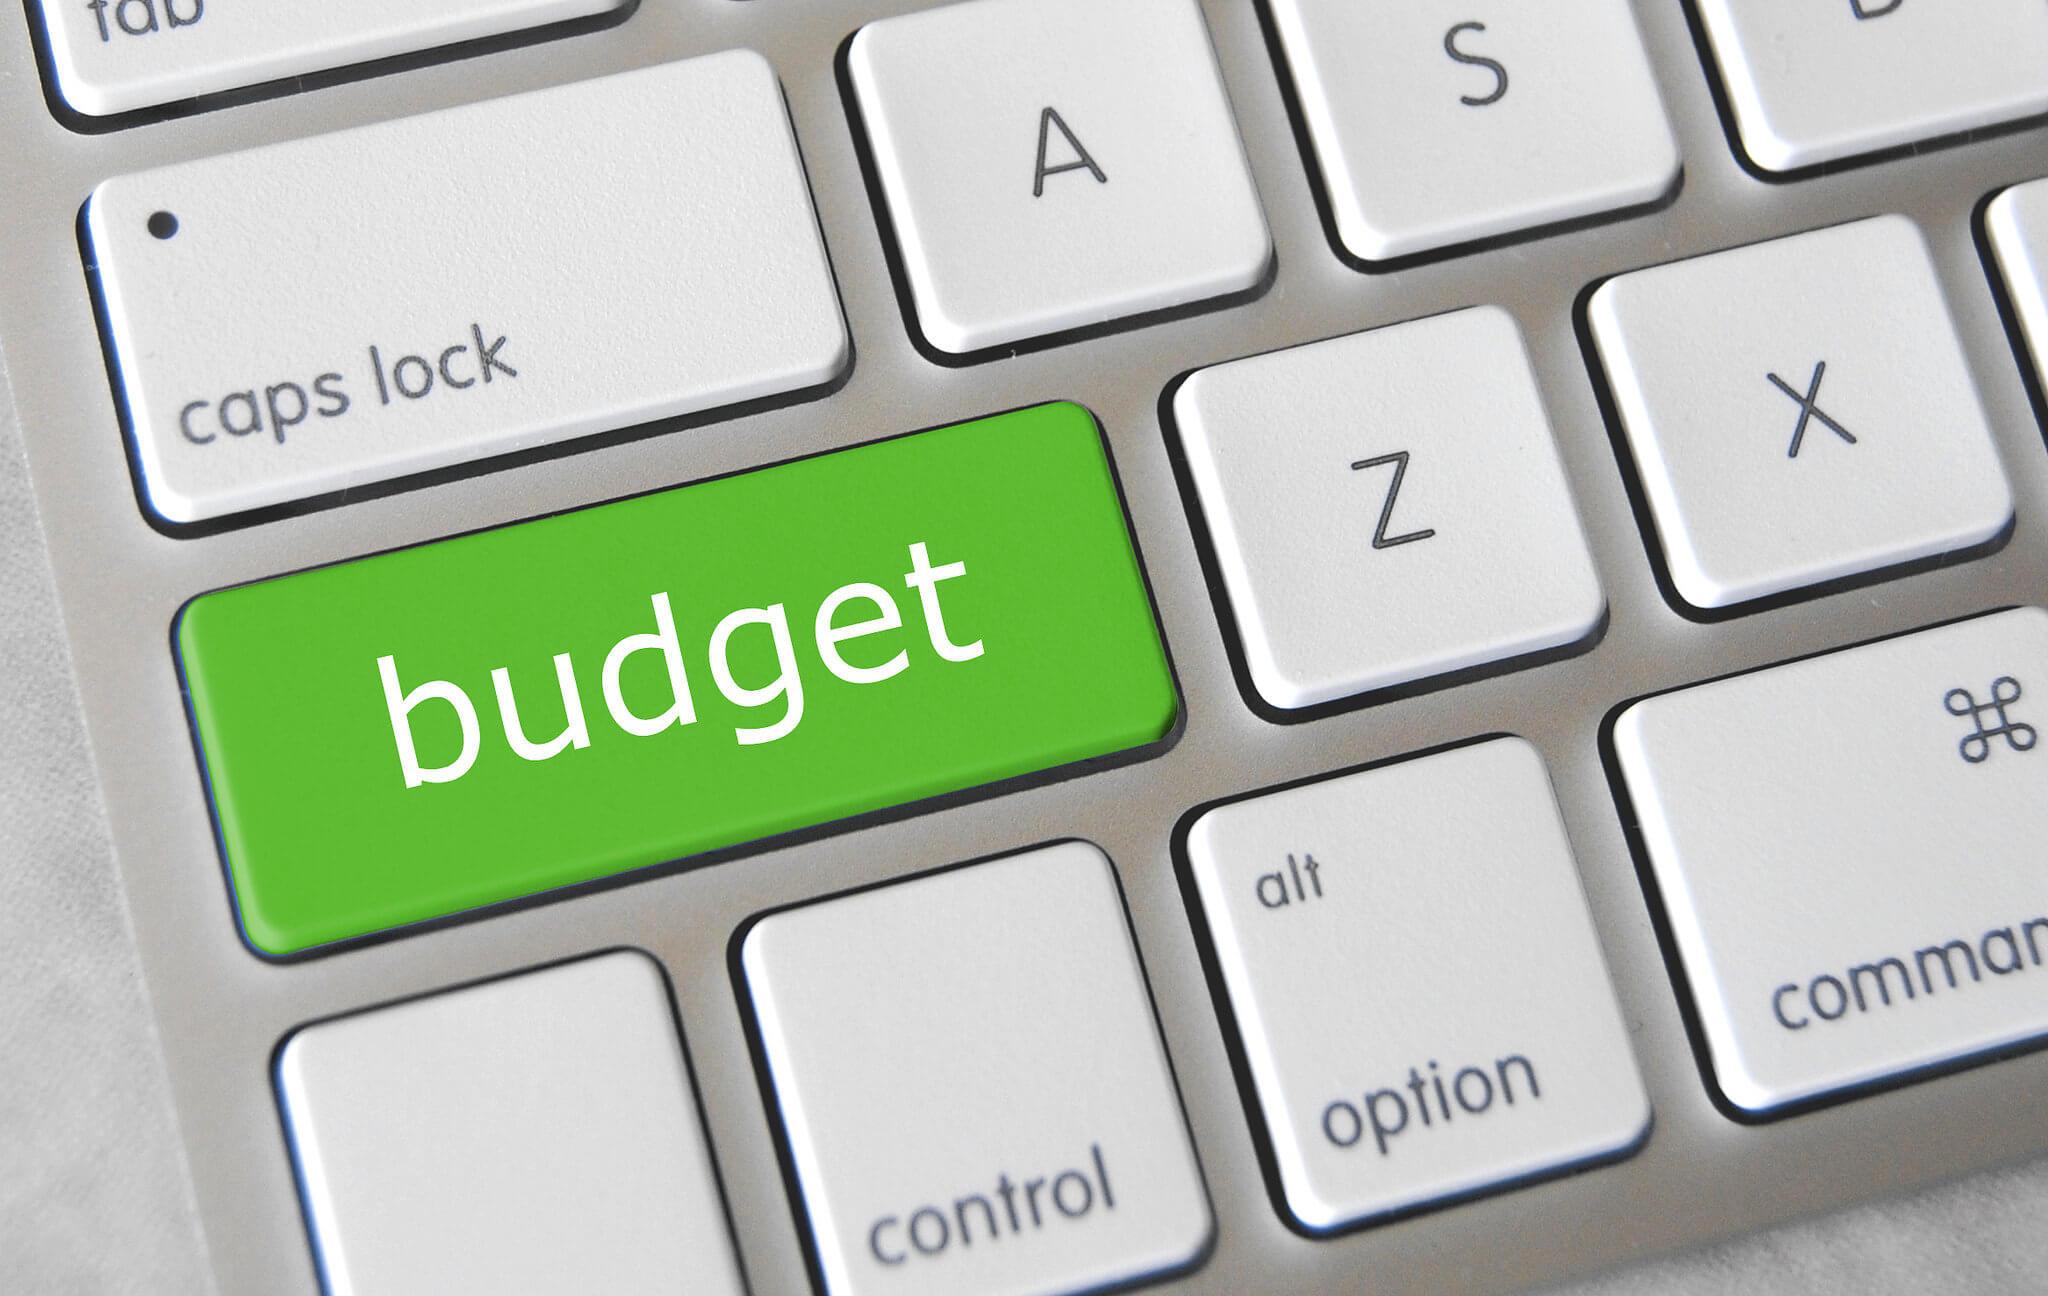 Green budget key on a keyboard